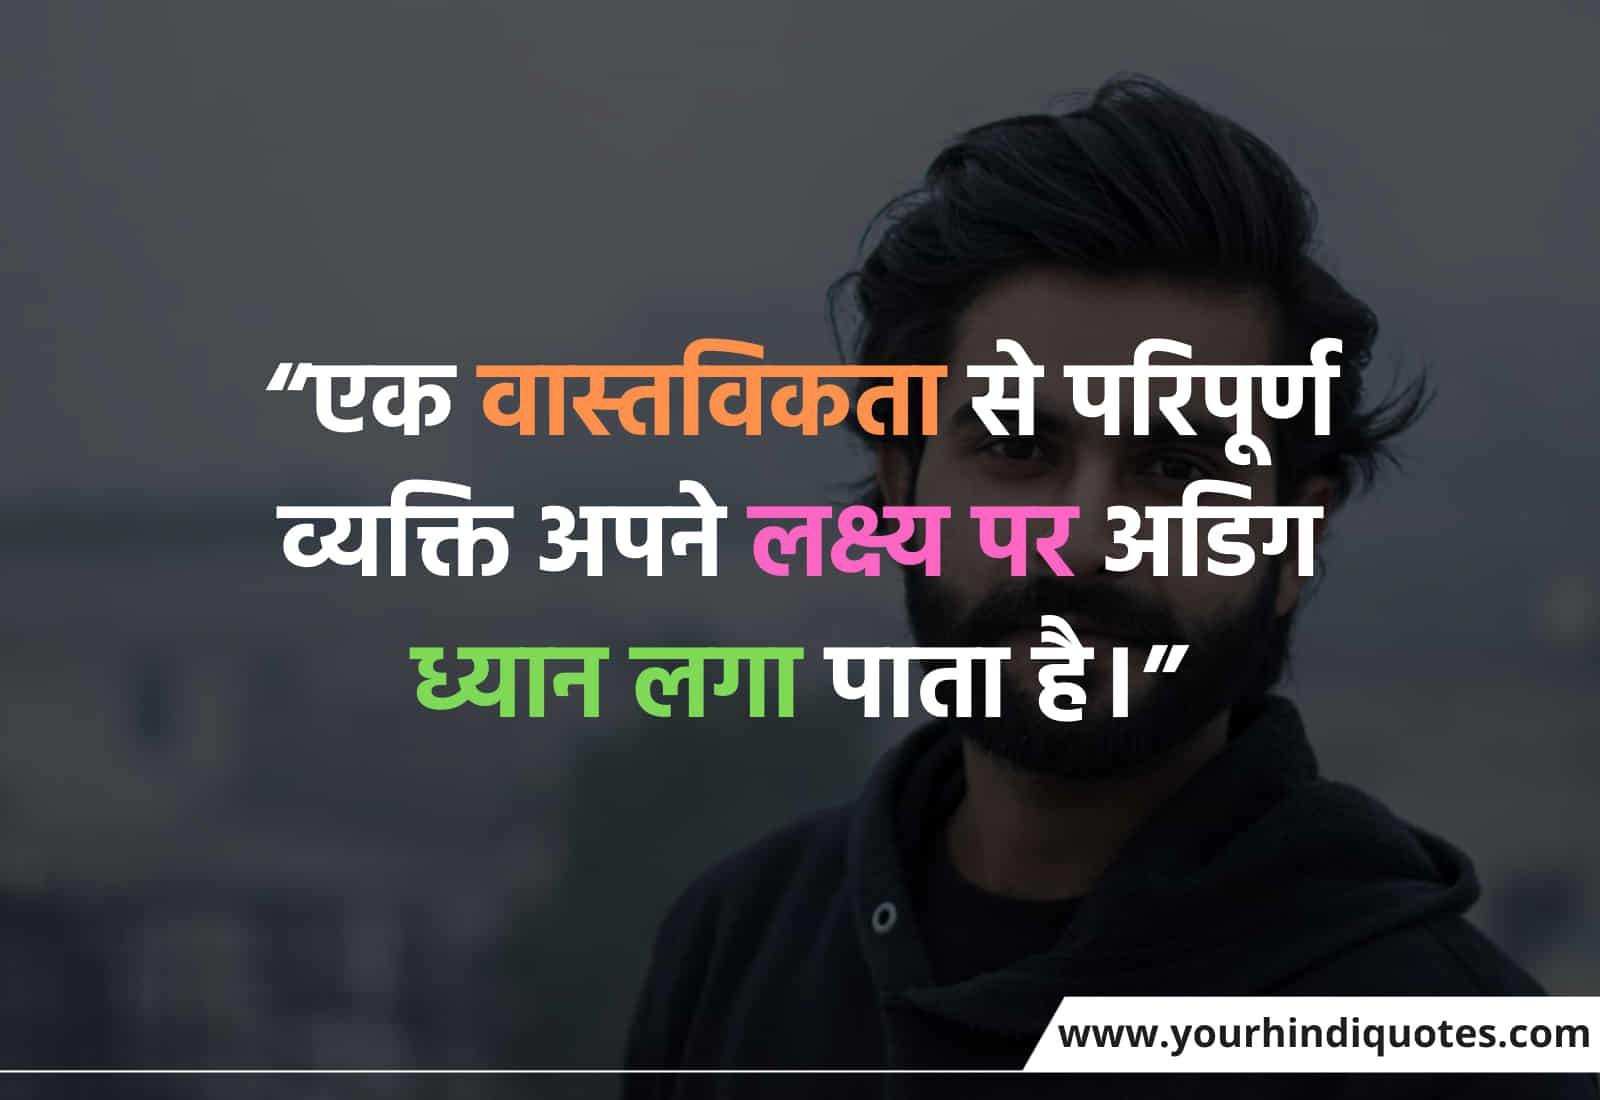 Hindi Shrimad Bhagwat Gita Quotes for Goal